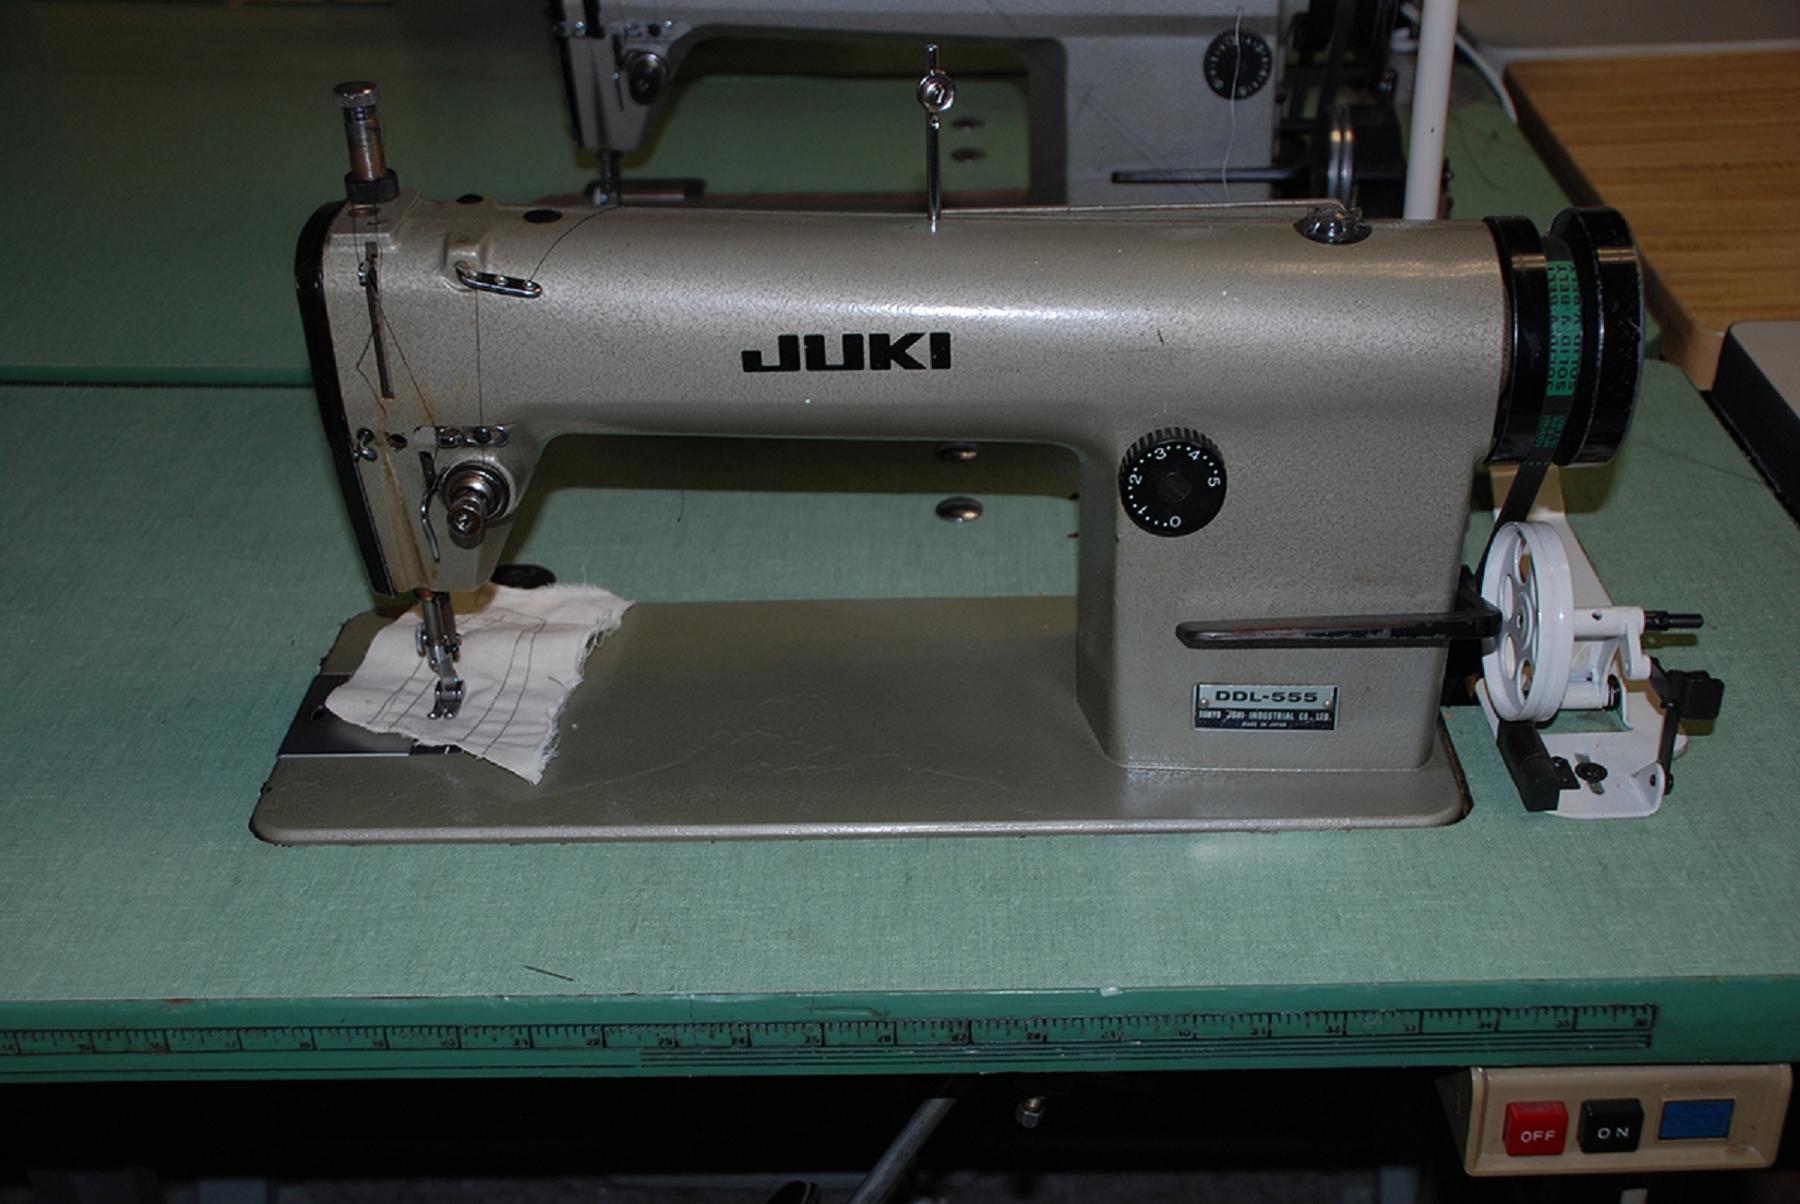 Juki manual ddl 555